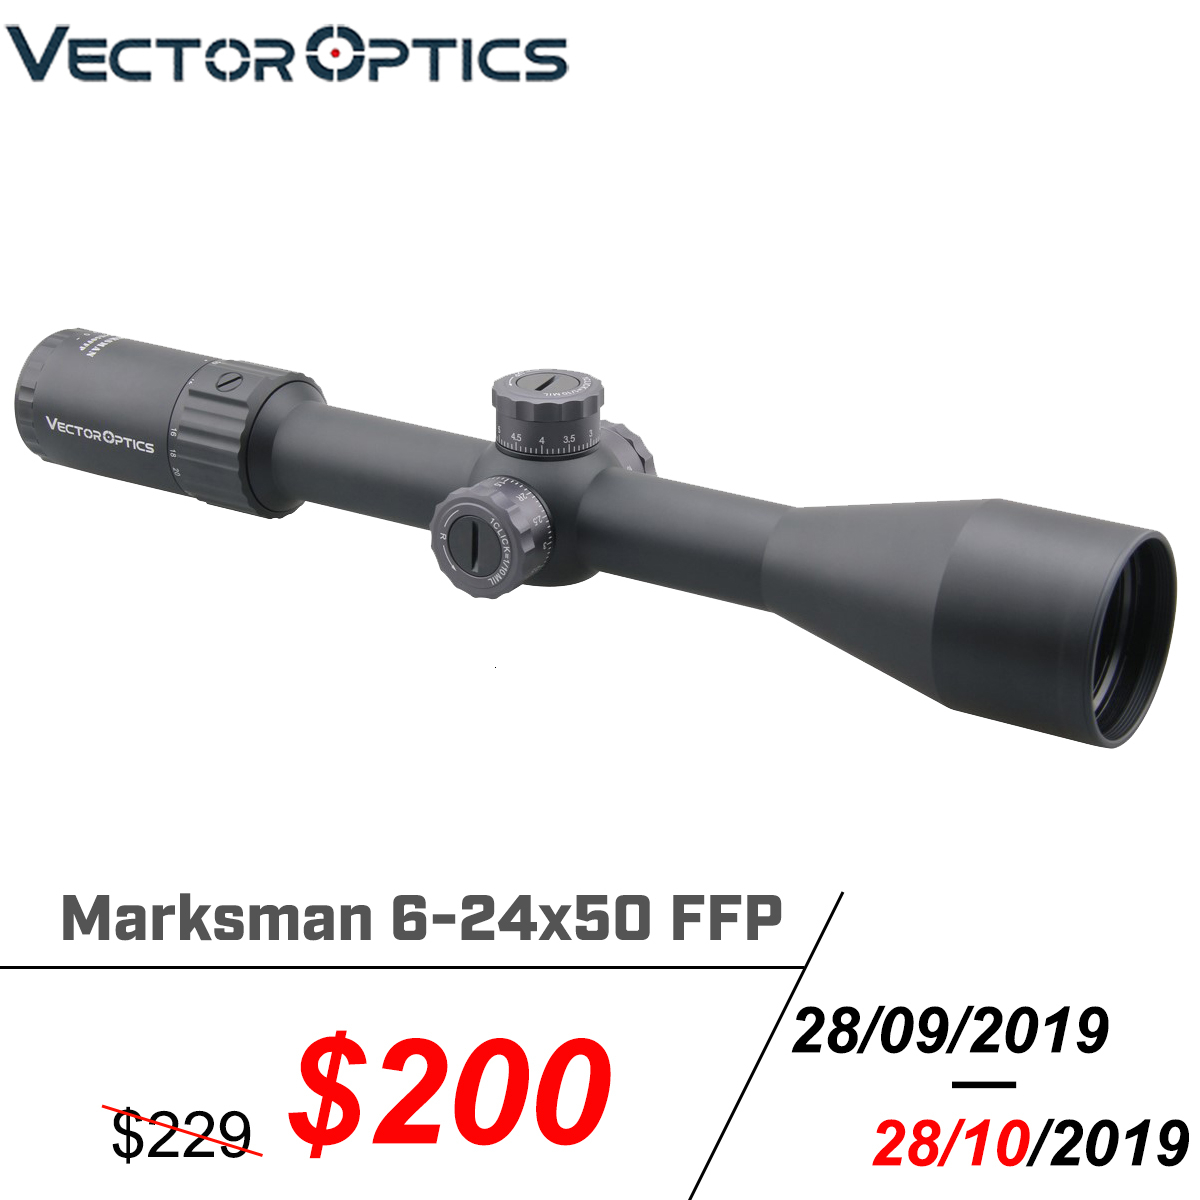 Vector Optics Marksman 6-24x50 FFP Tactical Riflescope 1/10 MIL Min Focus 10 Yds First Focal Plane Hunting Rifle Scope .338 Lap